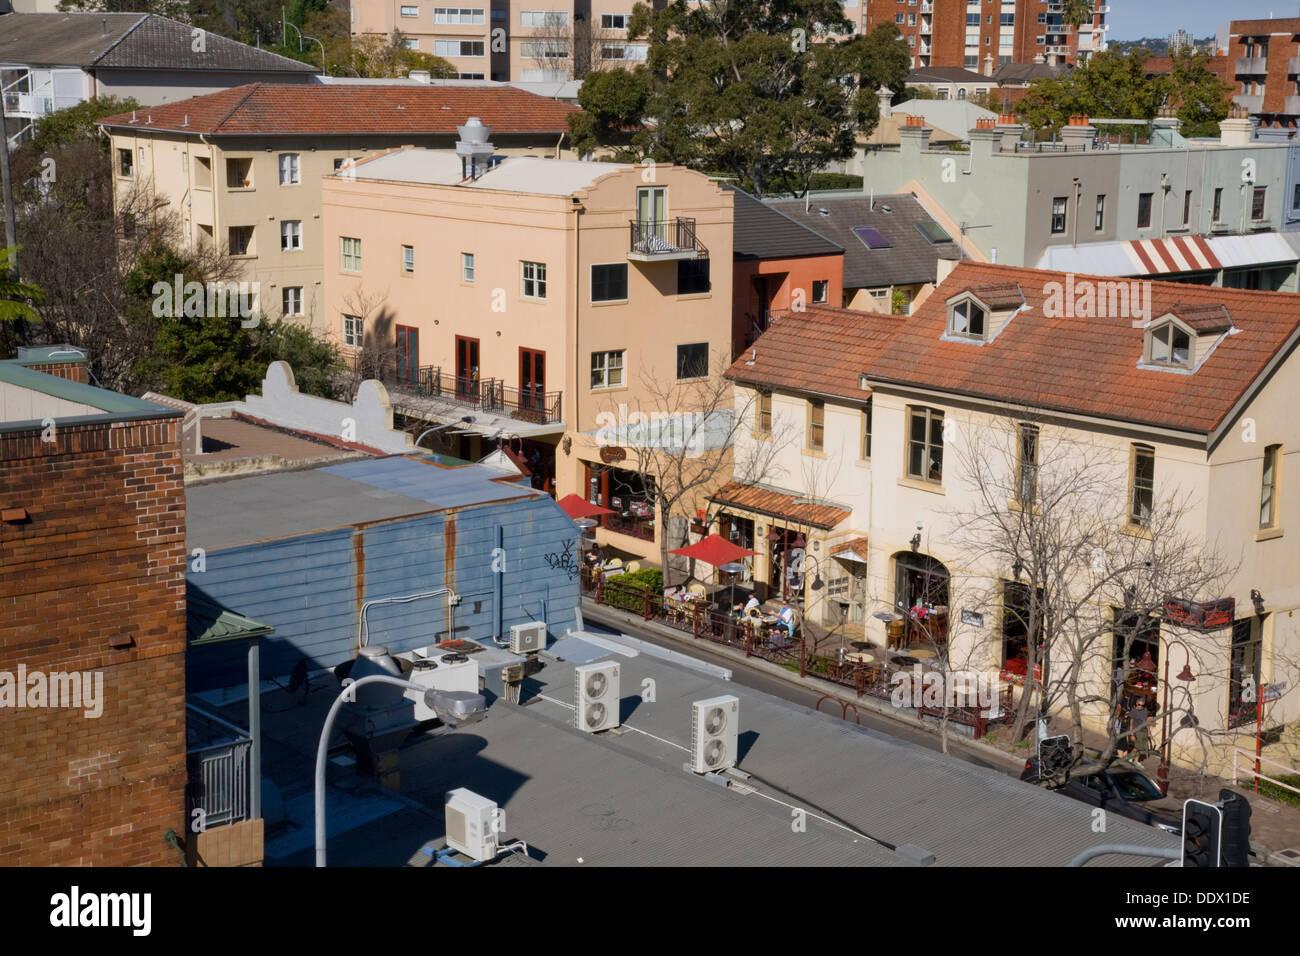 kirribilli viewed from harbour bridge,sydney - Stock Image